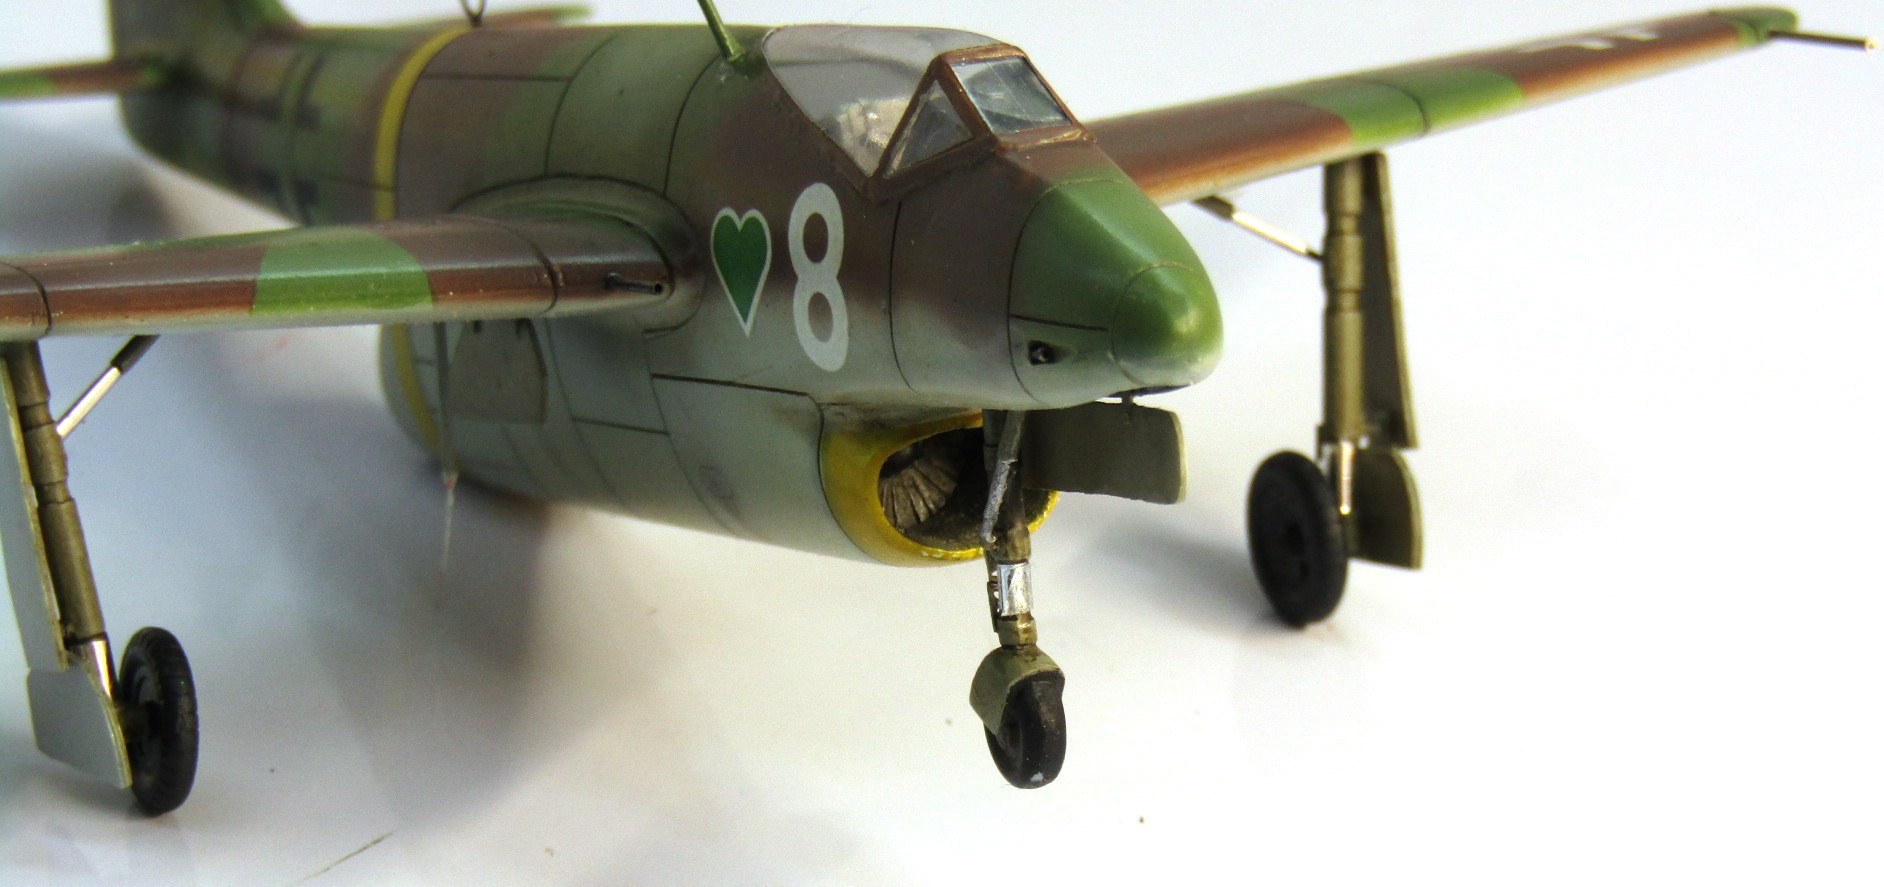 Fw-P-II 1/72 (Special Hobby) LZG7Um8x4zg